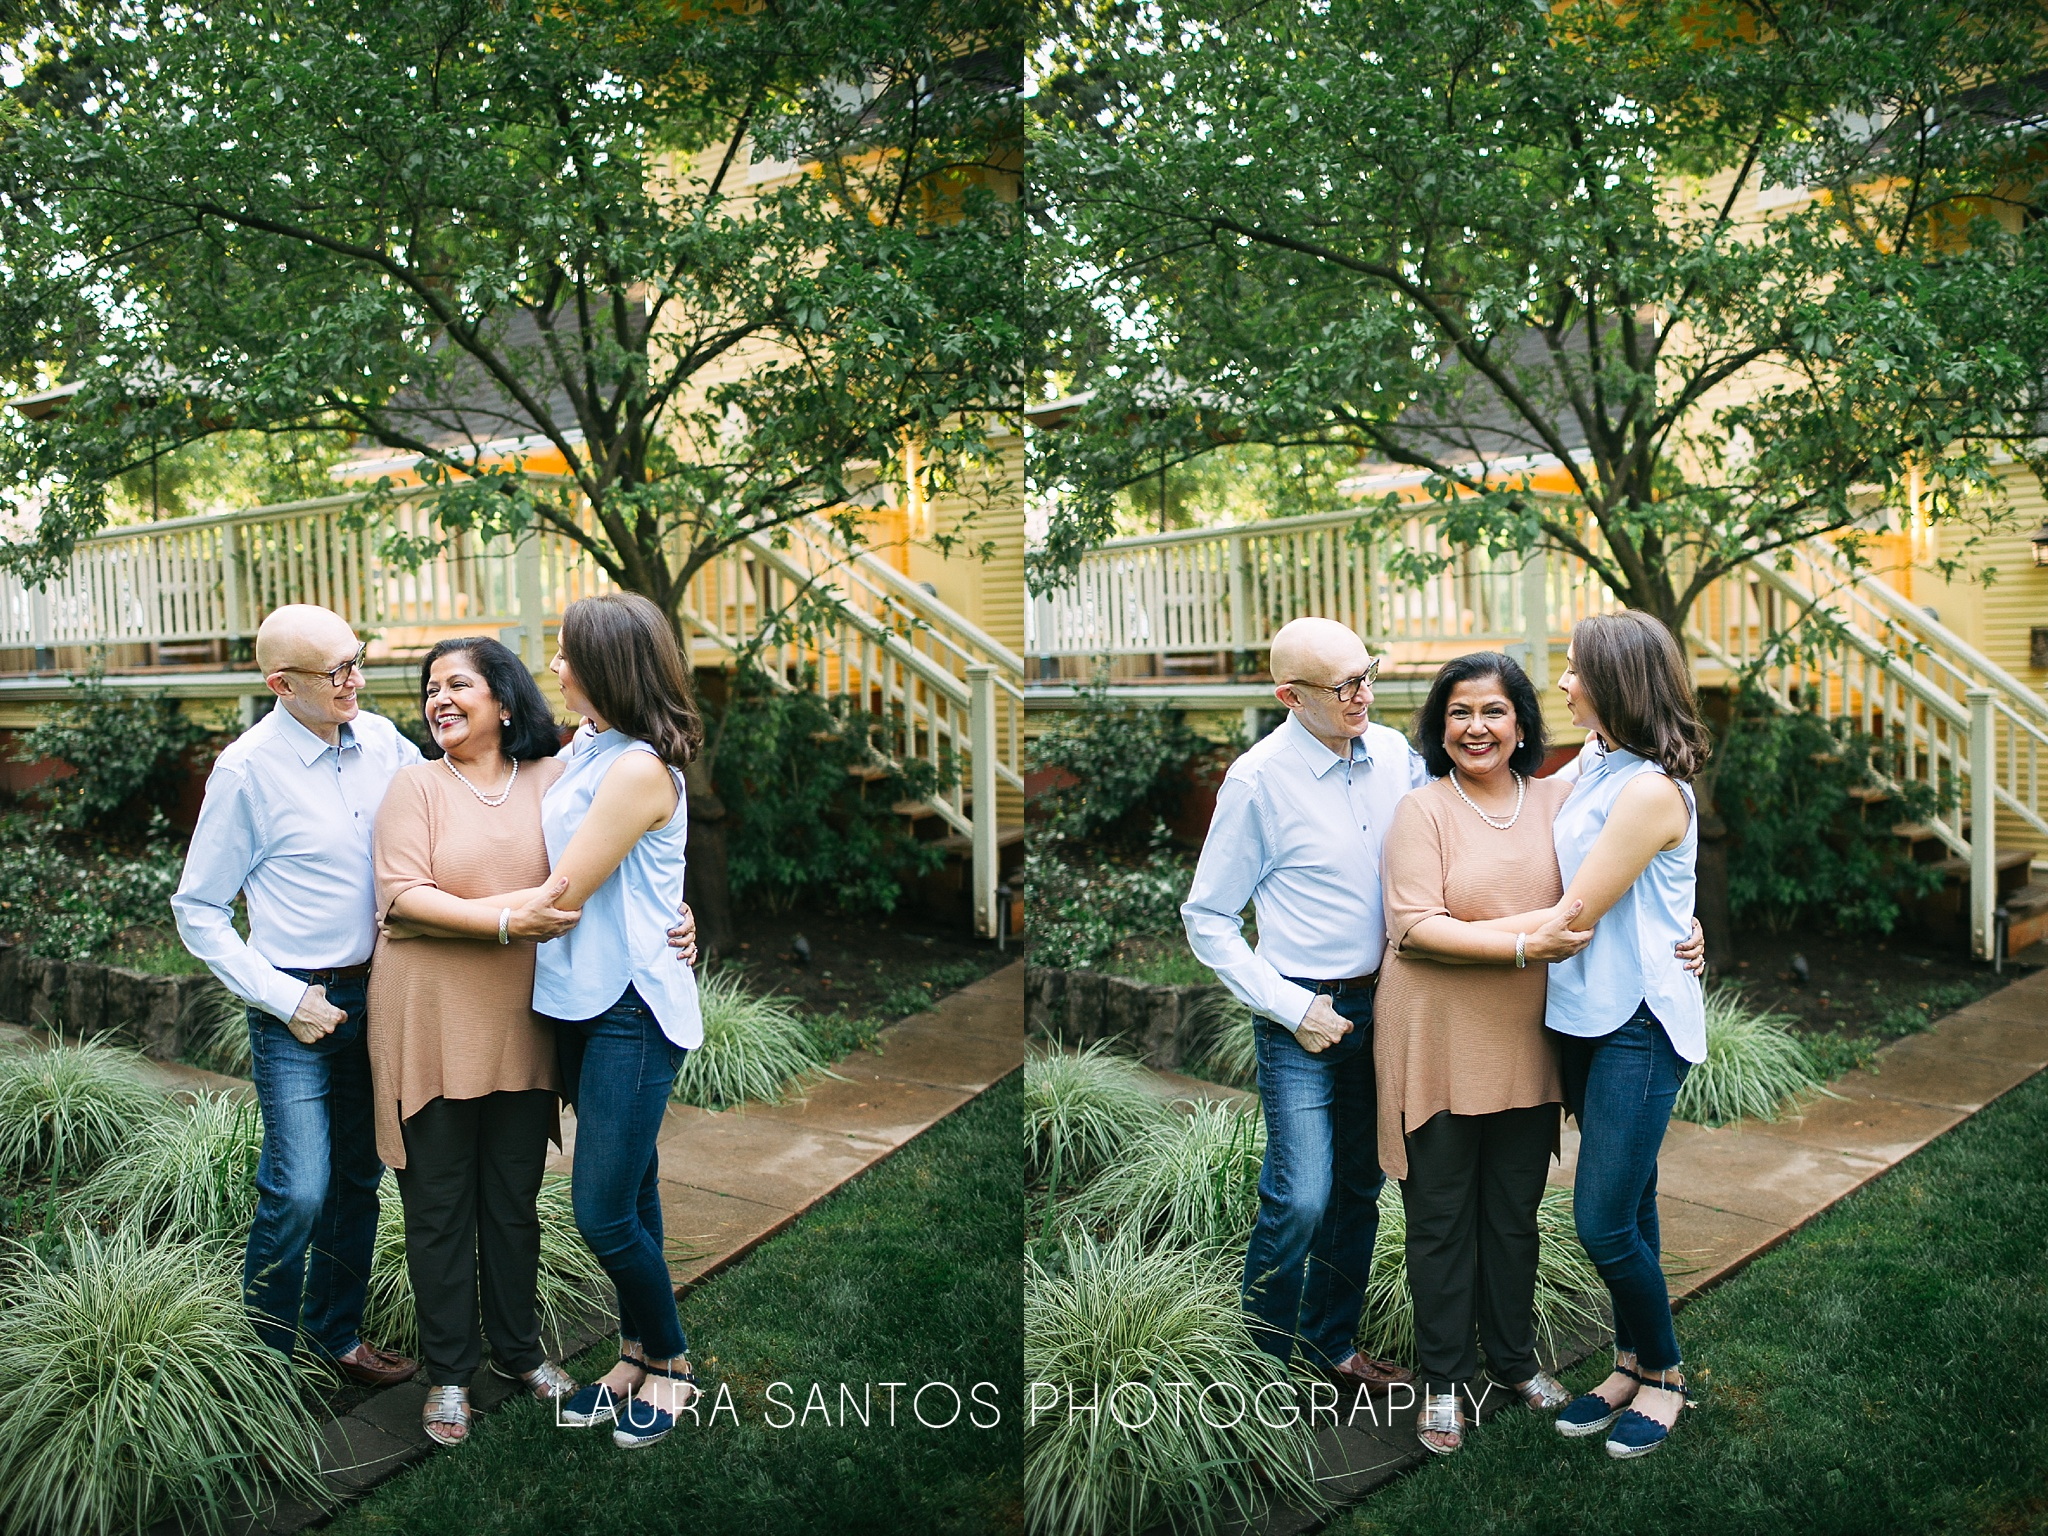 Laura Santos Photography Portland Oregon Family Photographer_0430.jpg